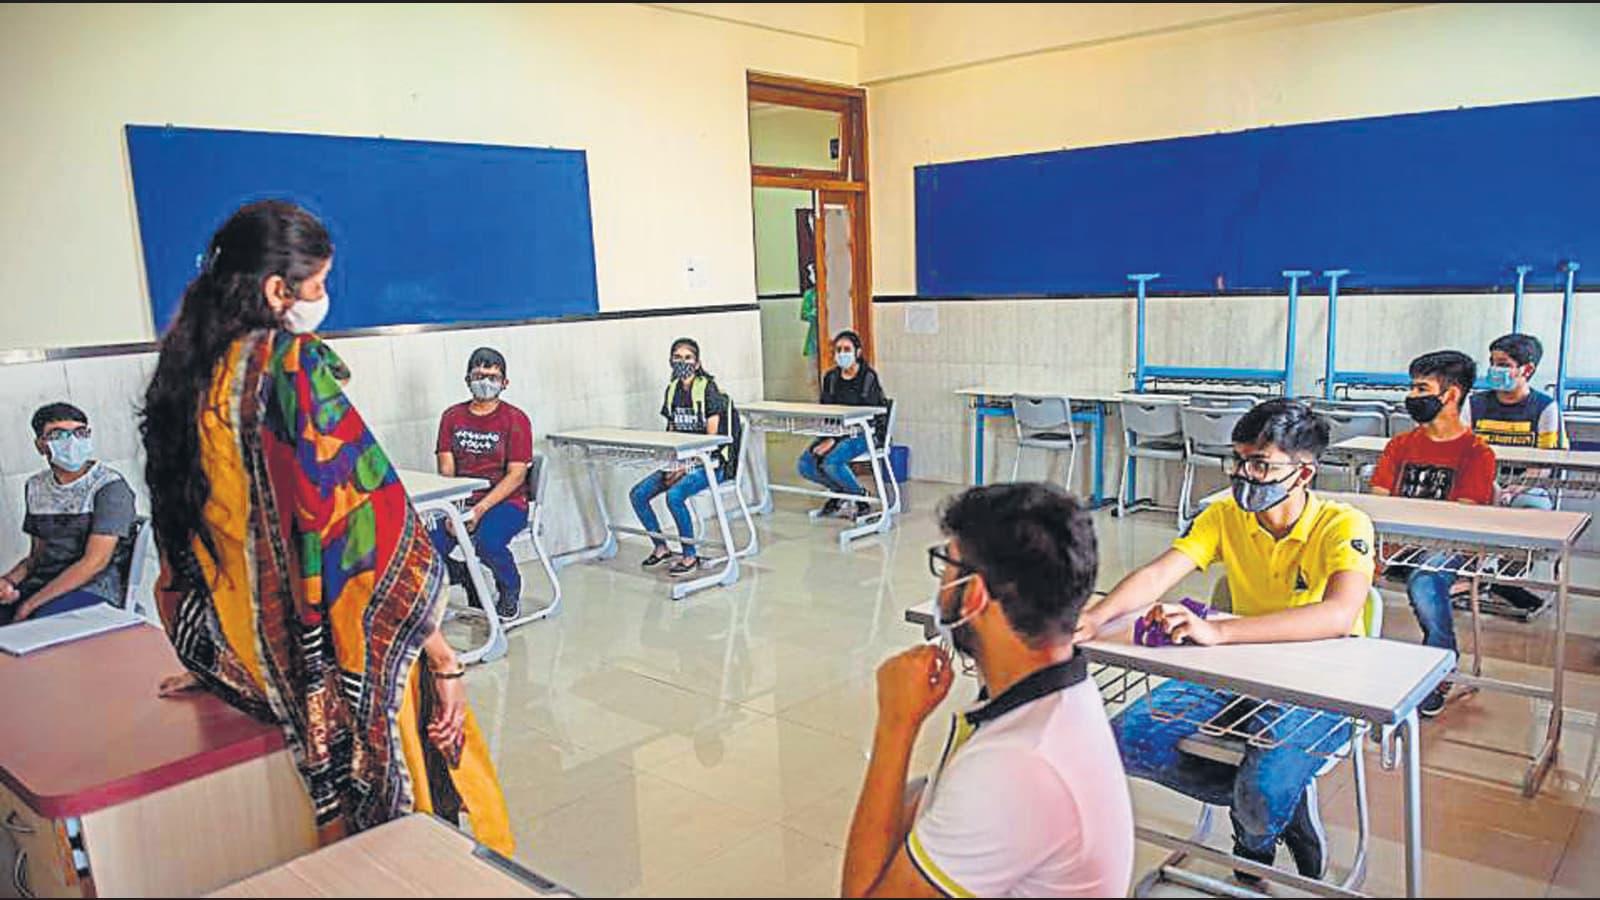 Maha schools reopen: Malad school students, teachers share pandemic experiences